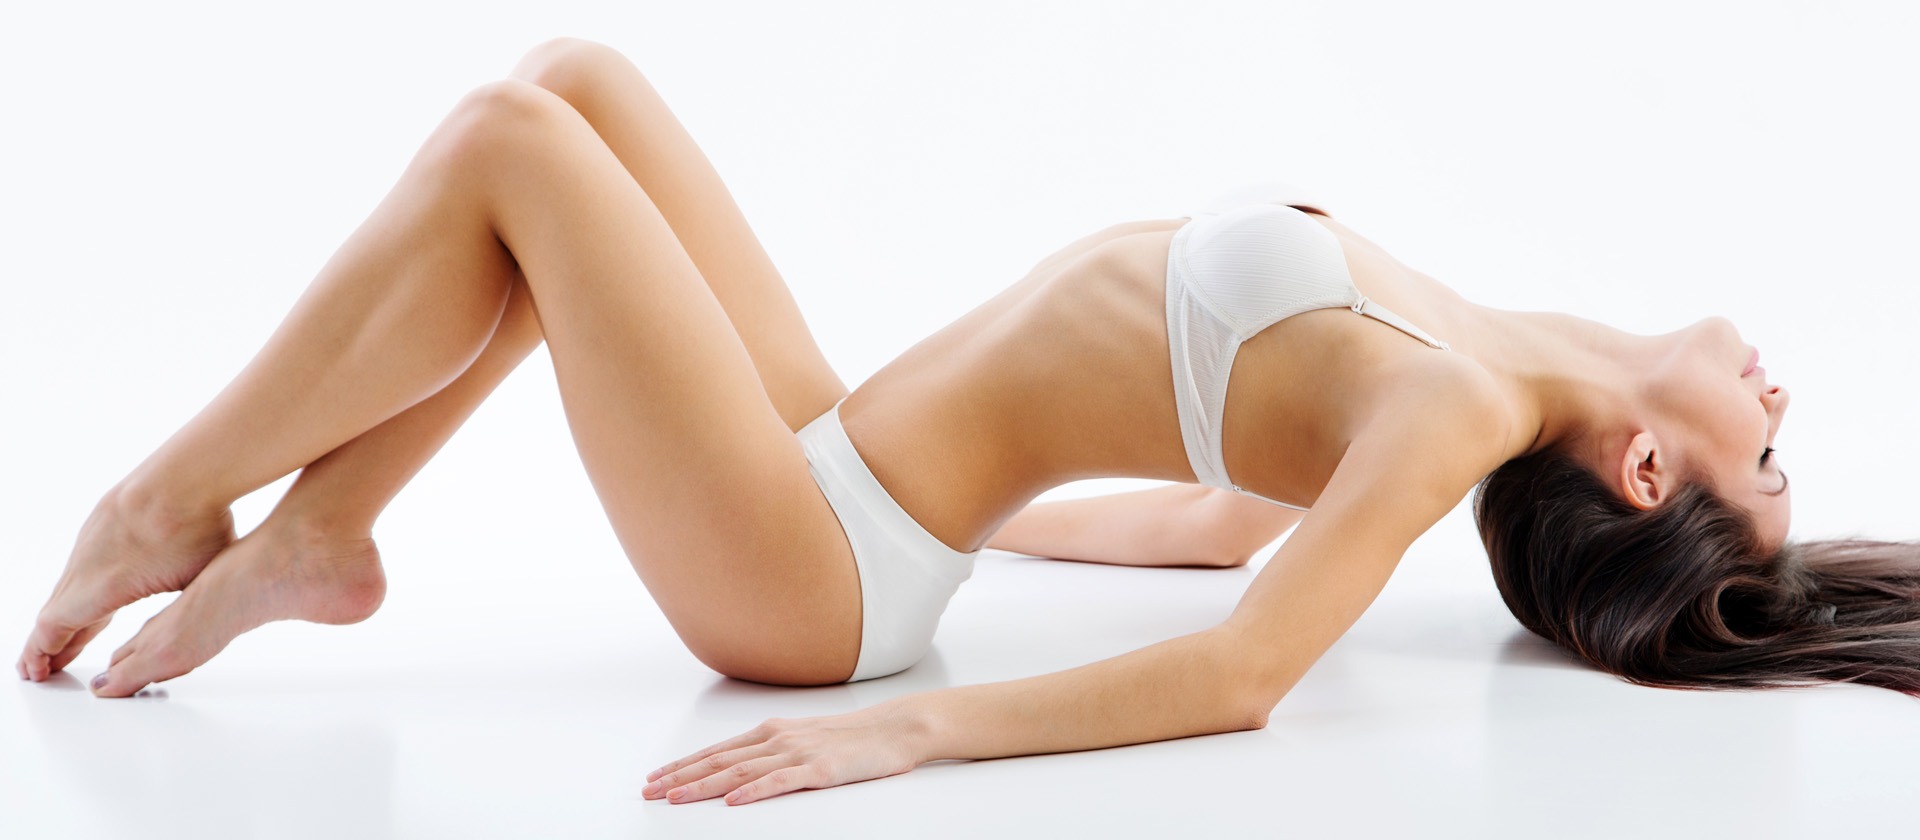 Cirugia plástica corporal - Cirujano plástico Dra. Carmen Huertas